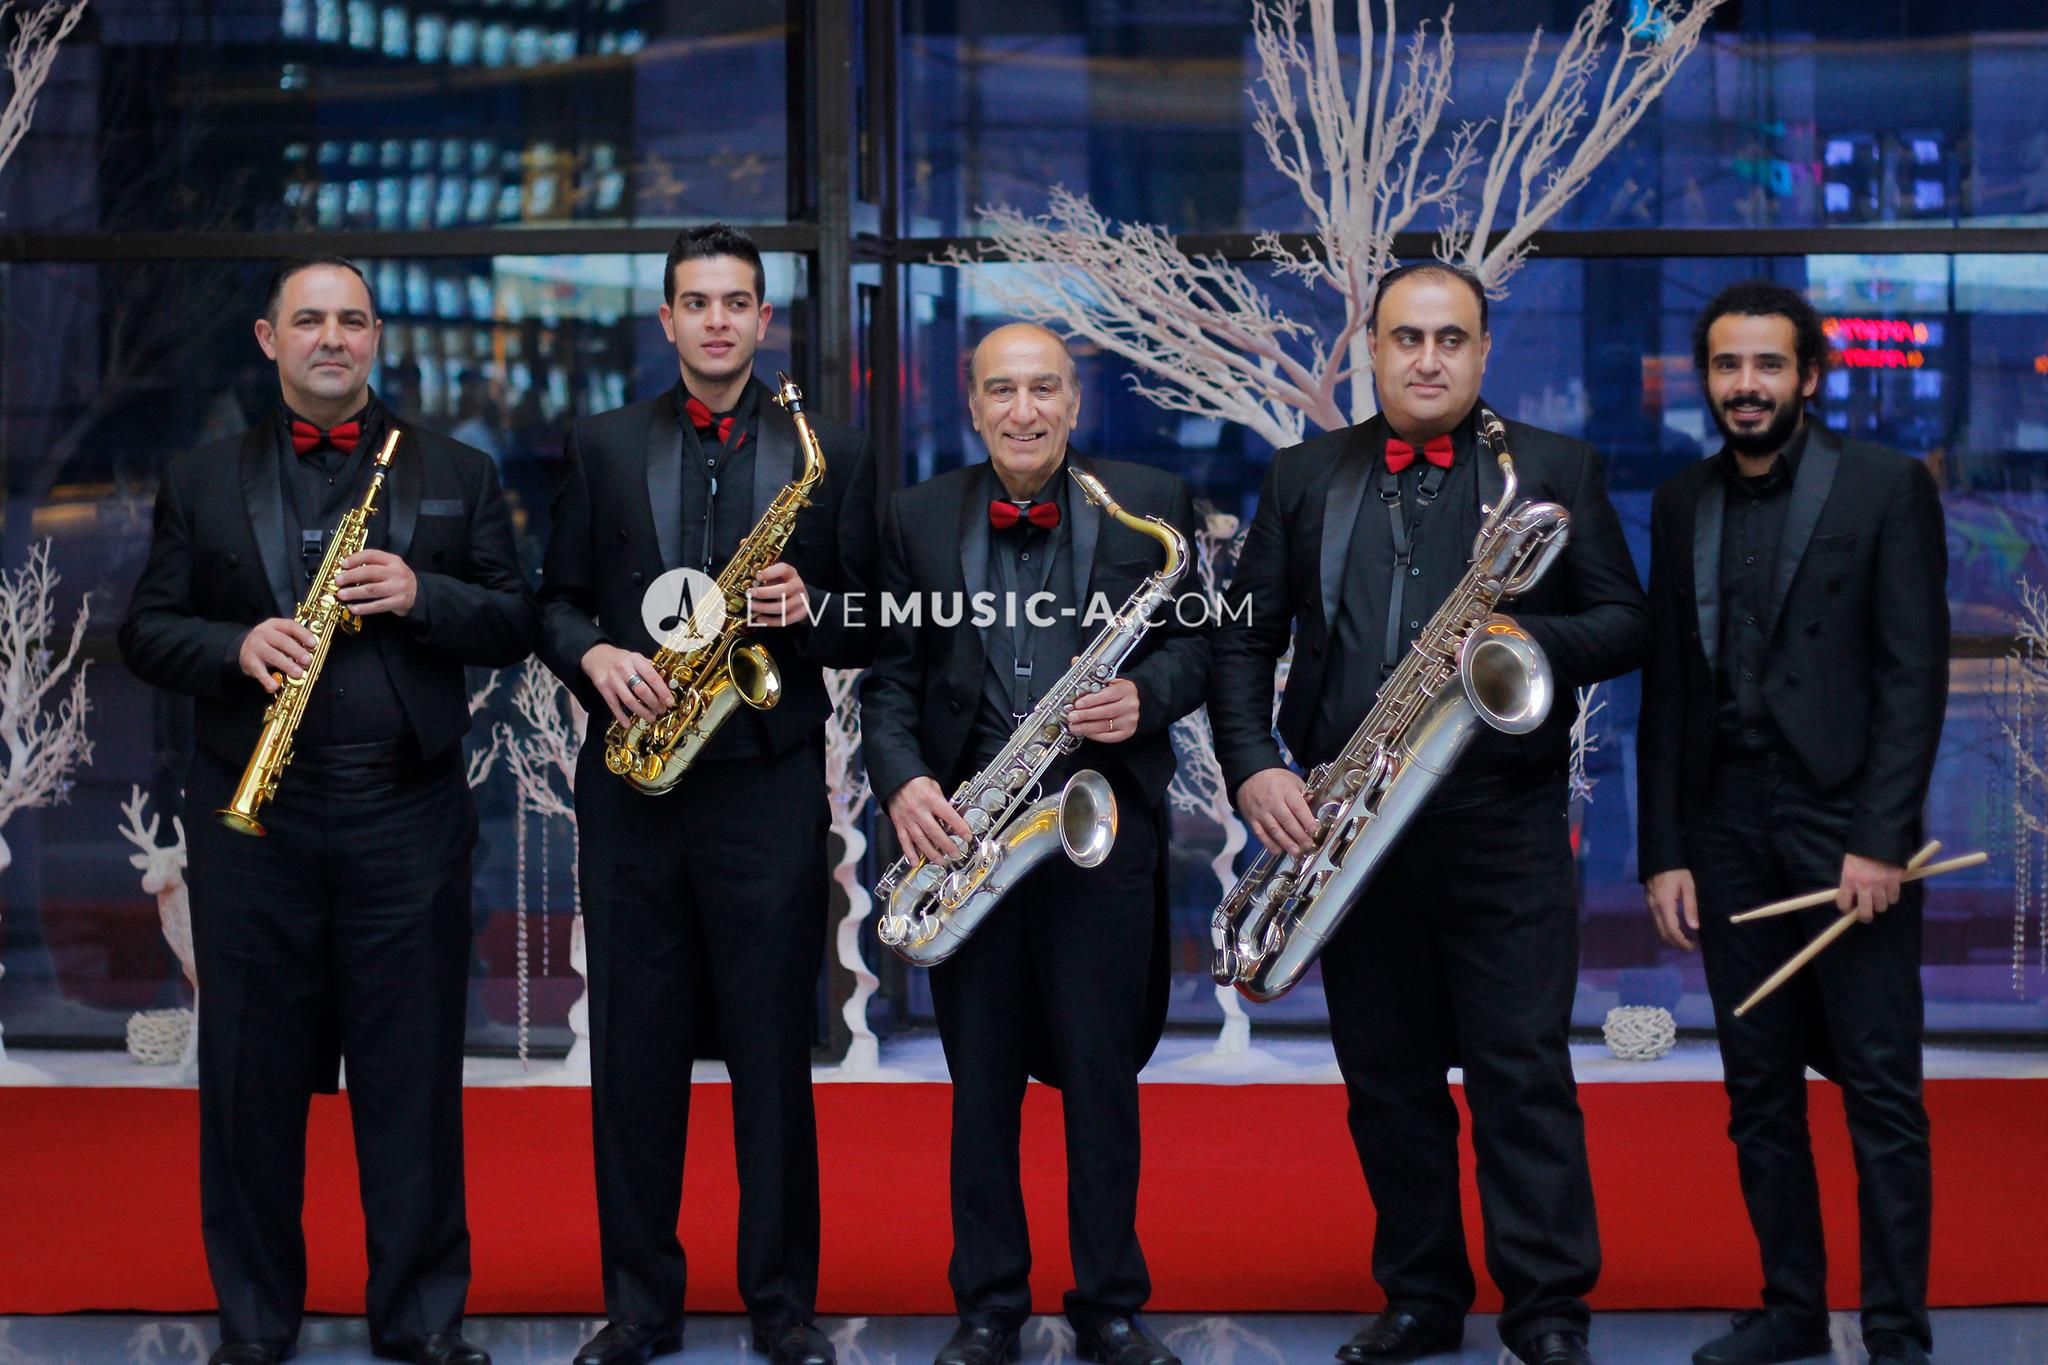 Krik's JAZZ quartet